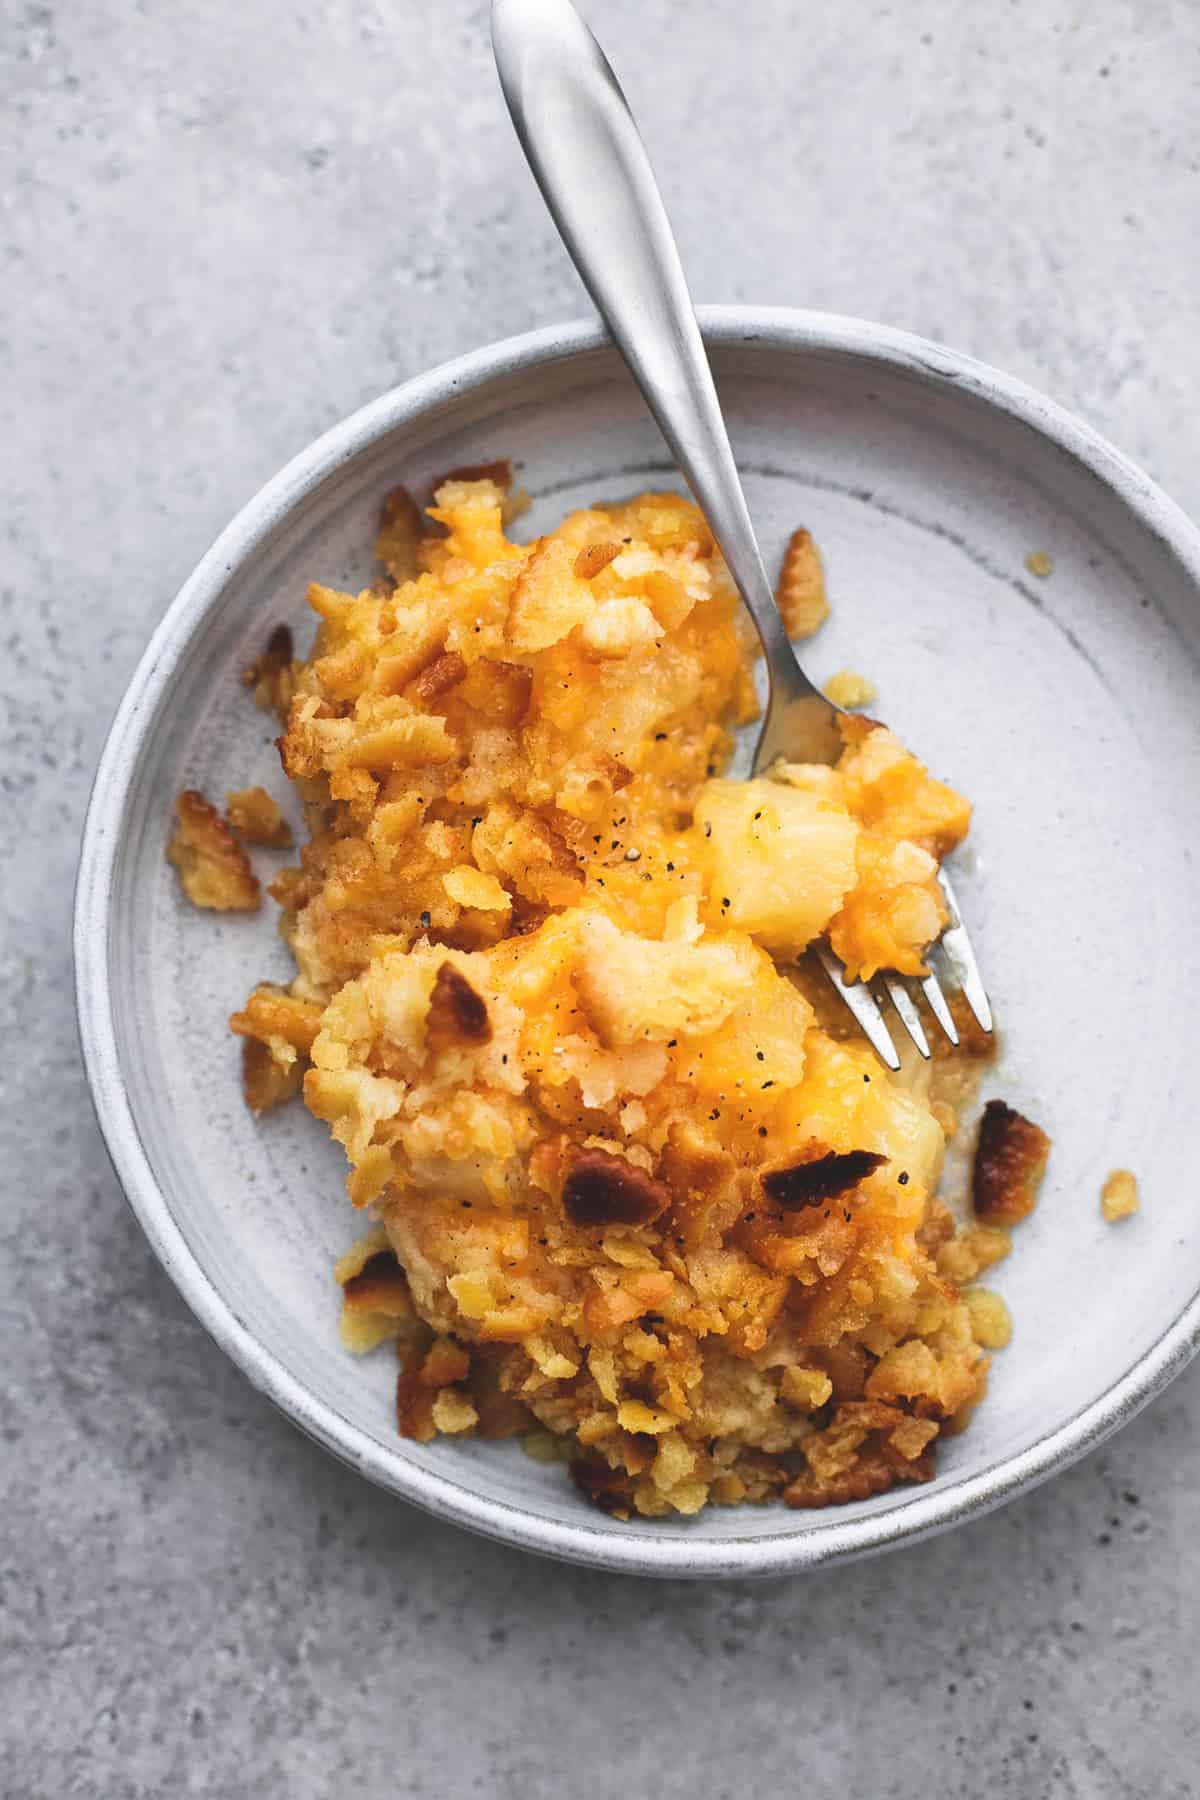 Baked Pineapple Casserole | lecremedelacrumb.com